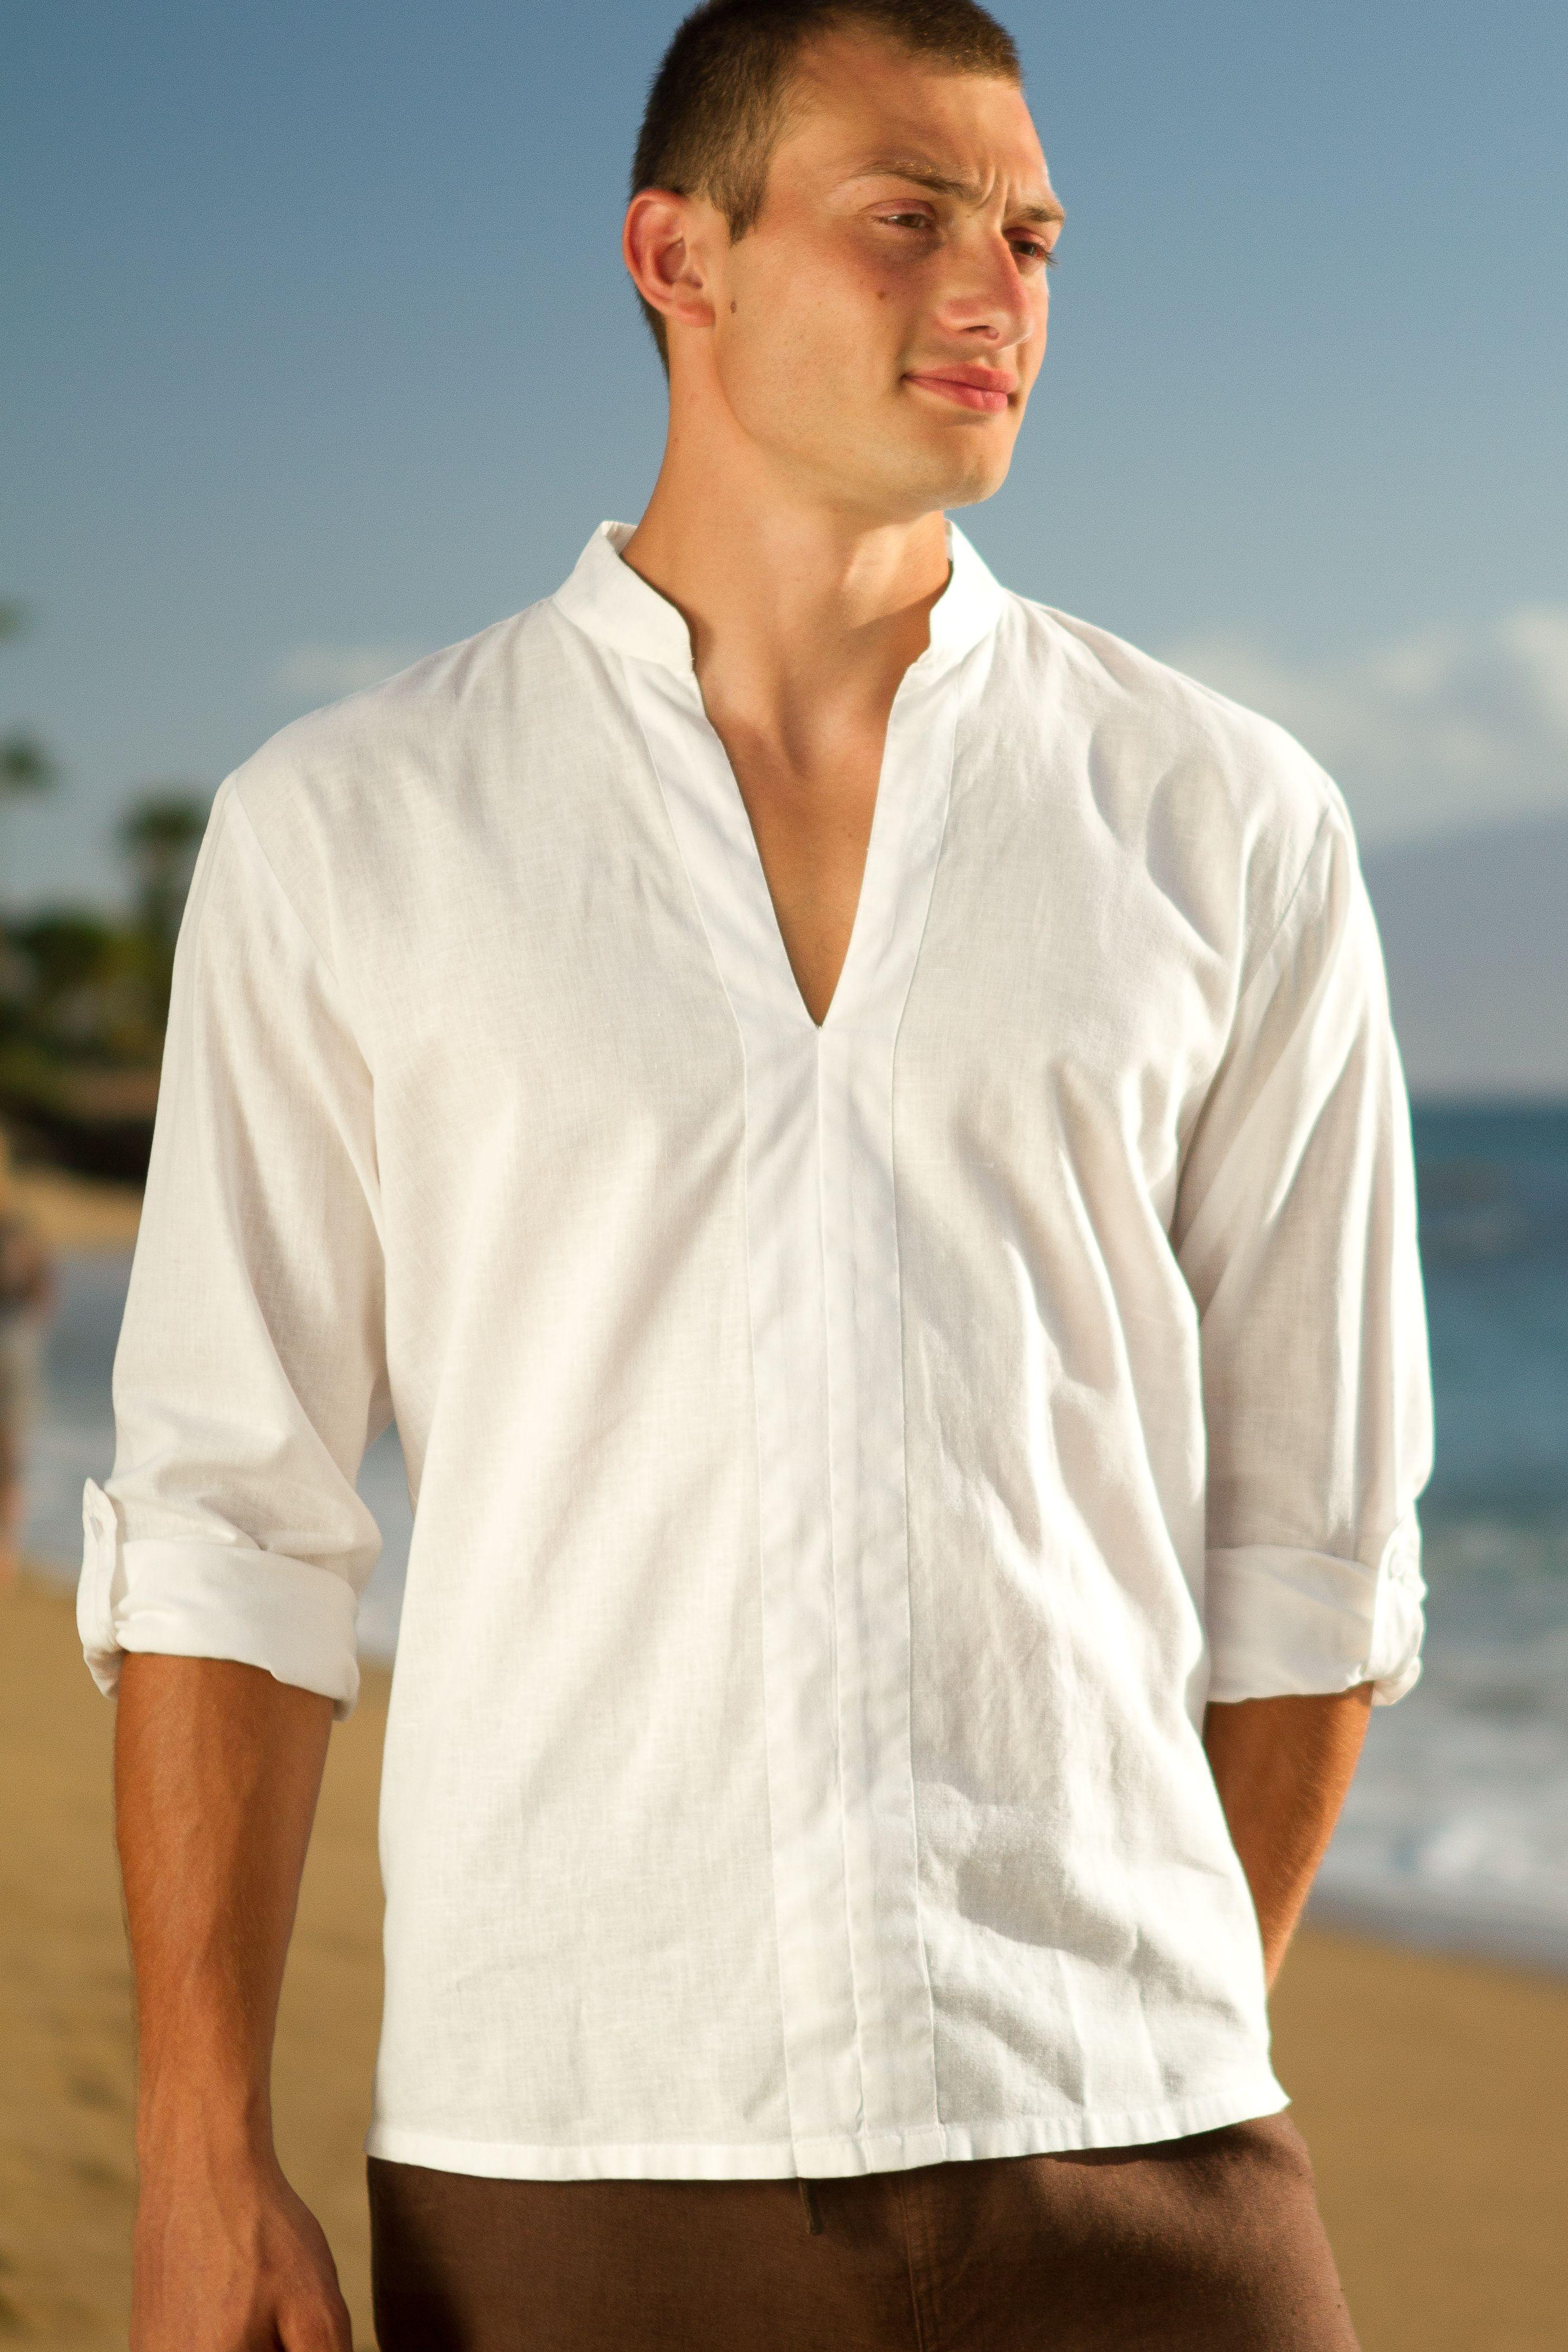 Linen oasis shirt linen shirt men oasis shirt white